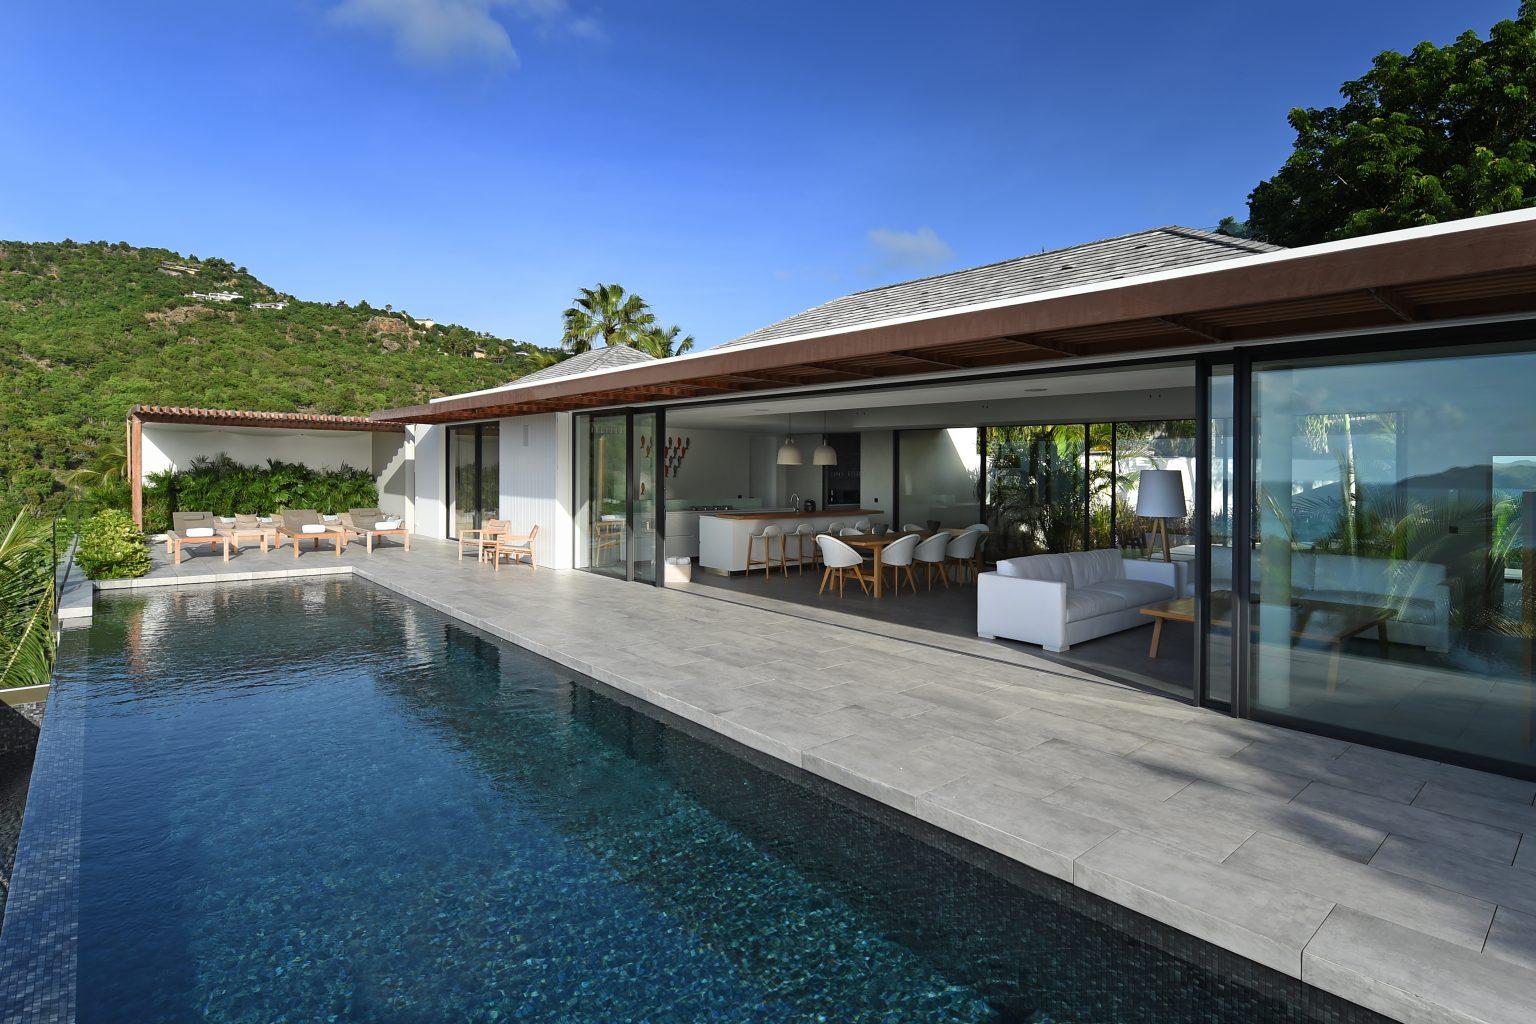 Villa Varuna - Modern and Elegant Villa Rental St Barth St Jean with Heated Pool - Outside View